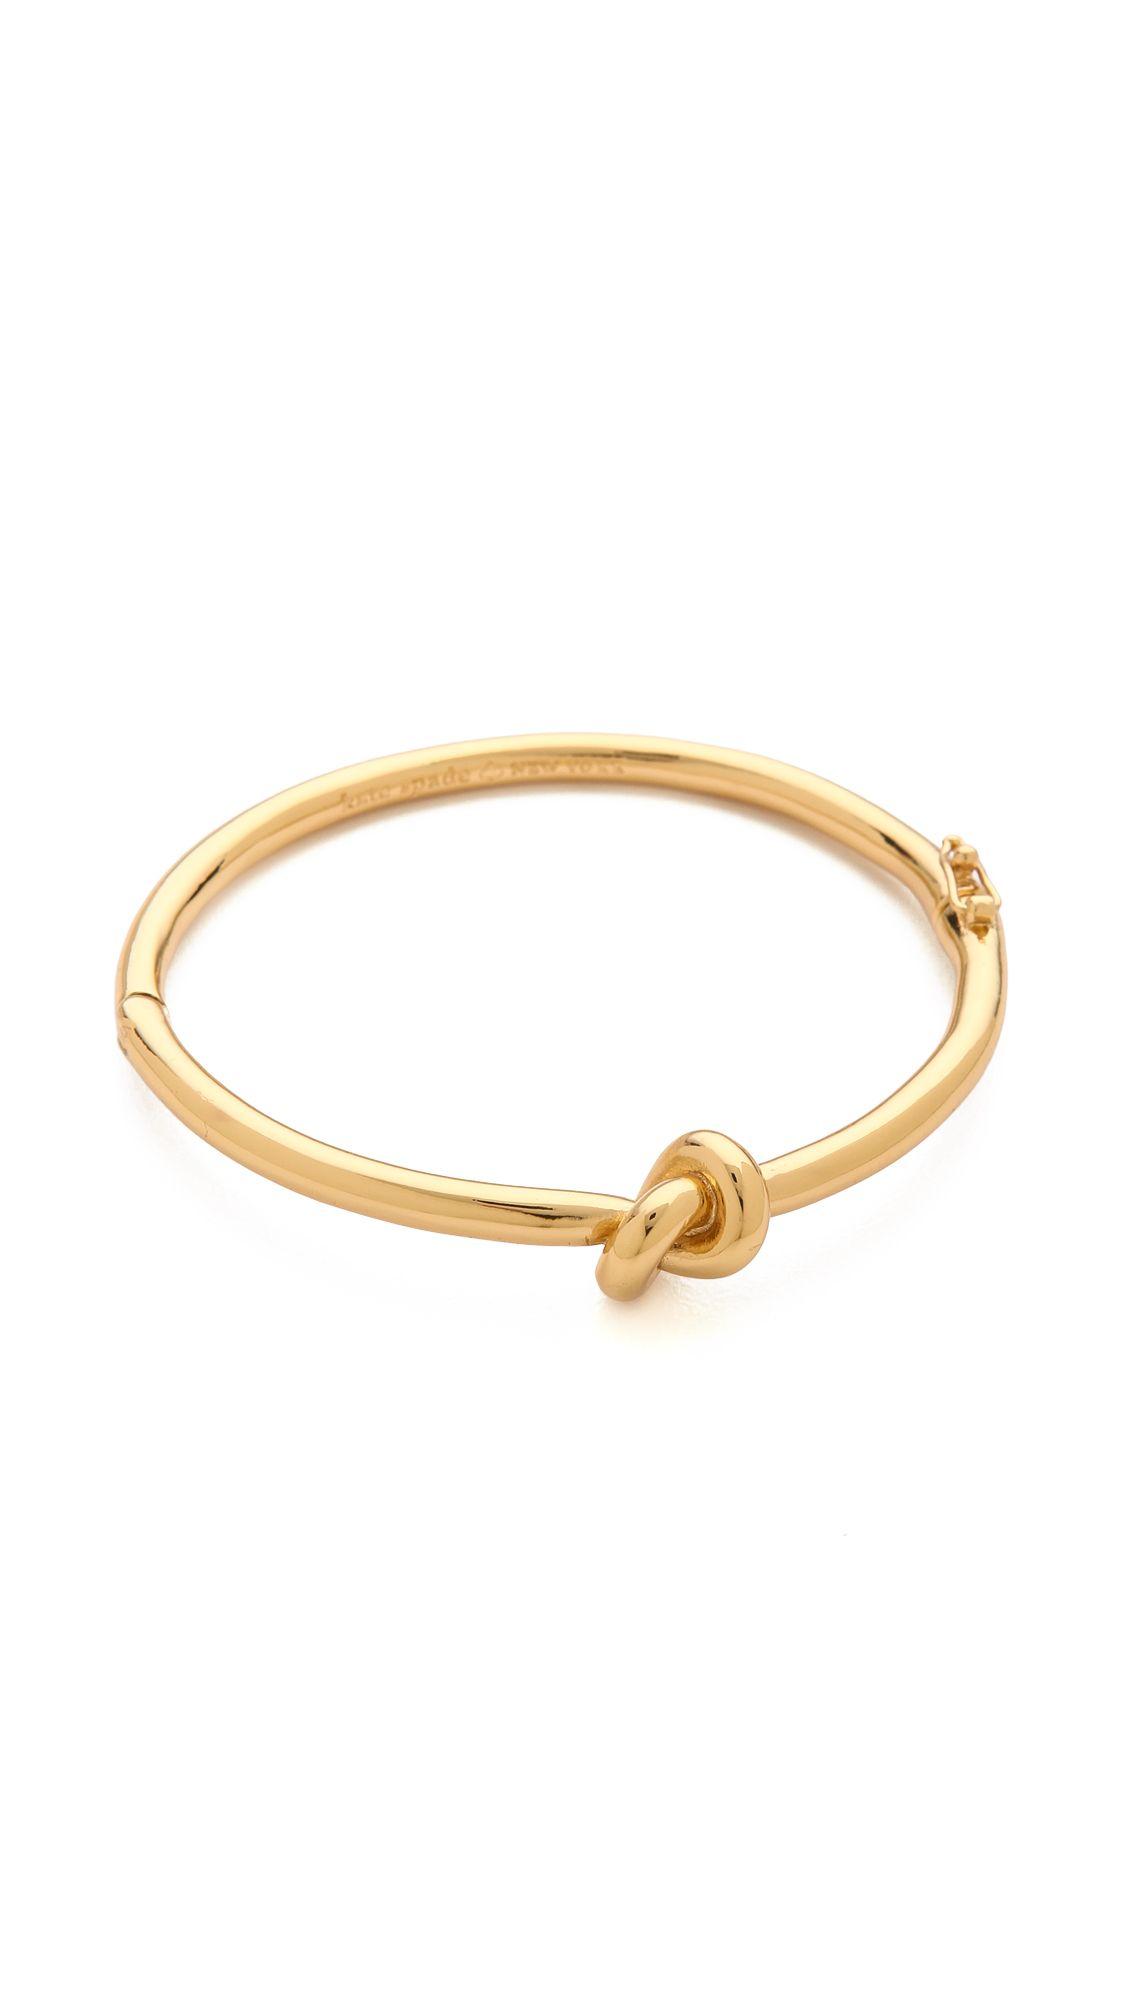 Kate Spade New York Sailors Knot Knot Slider Bracelet EnfuOfv55h